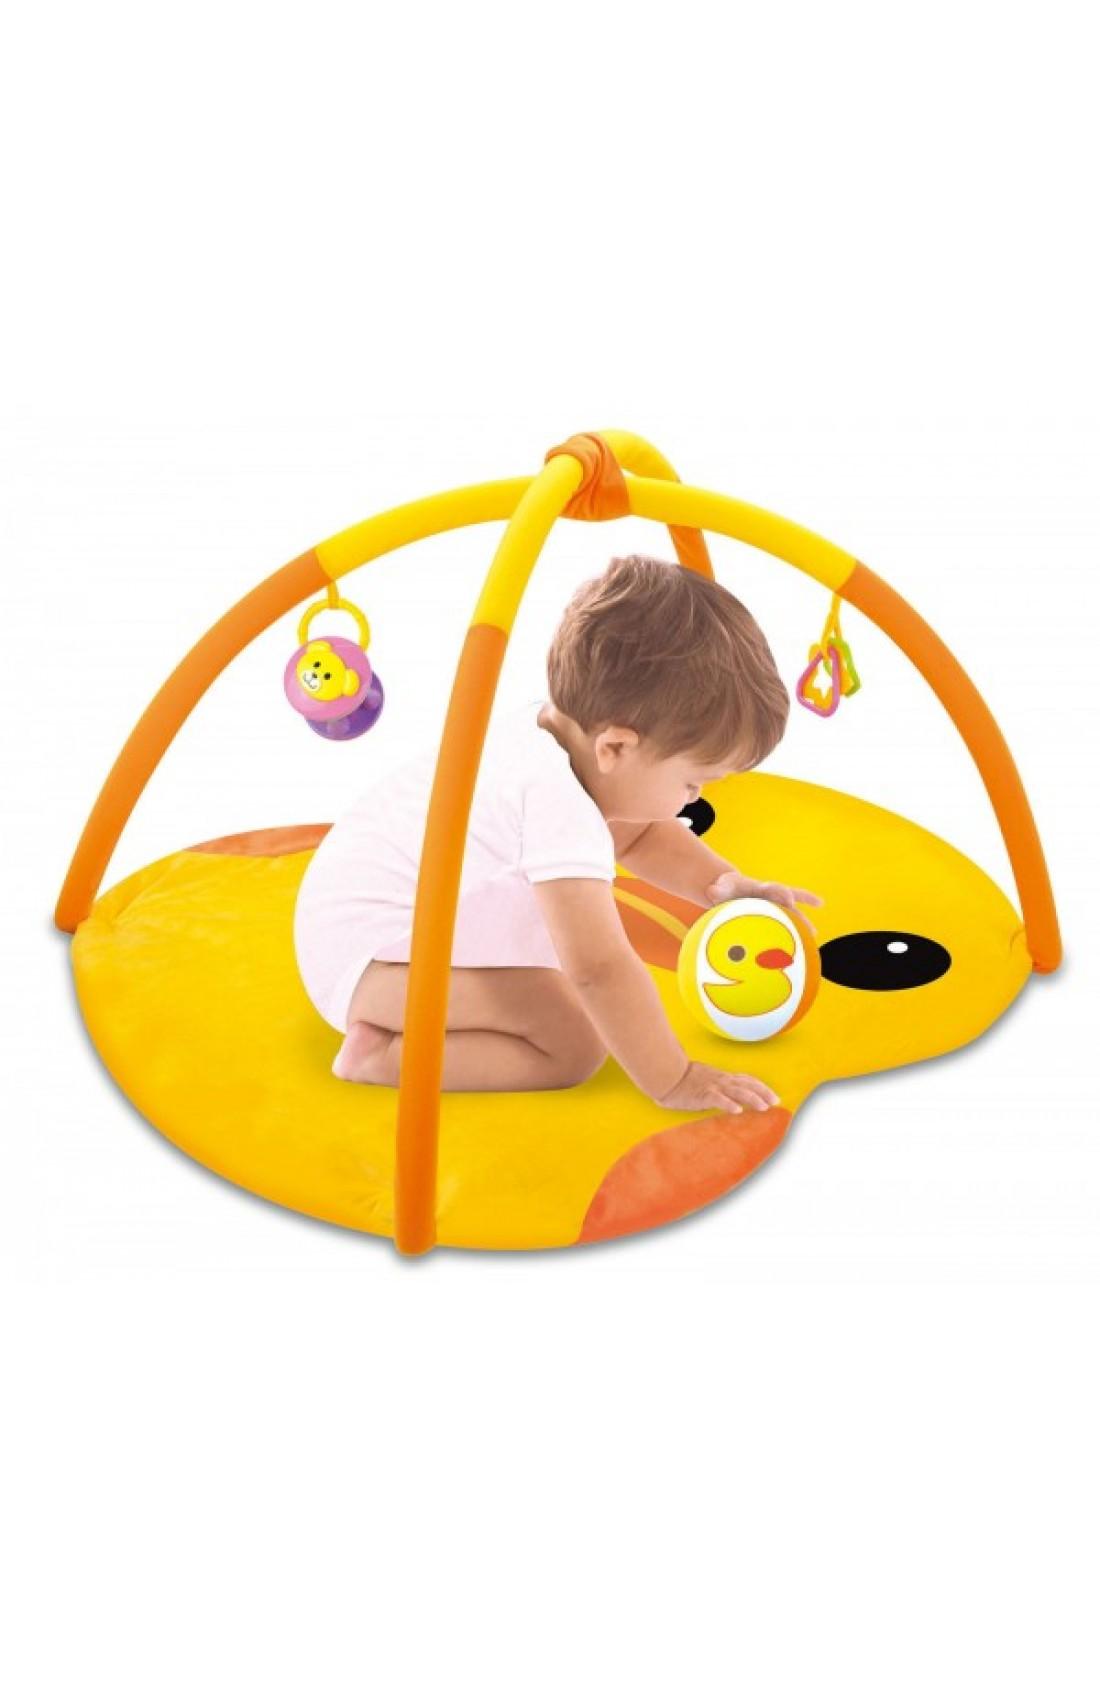 Baby Play Mat // Yellow duck design